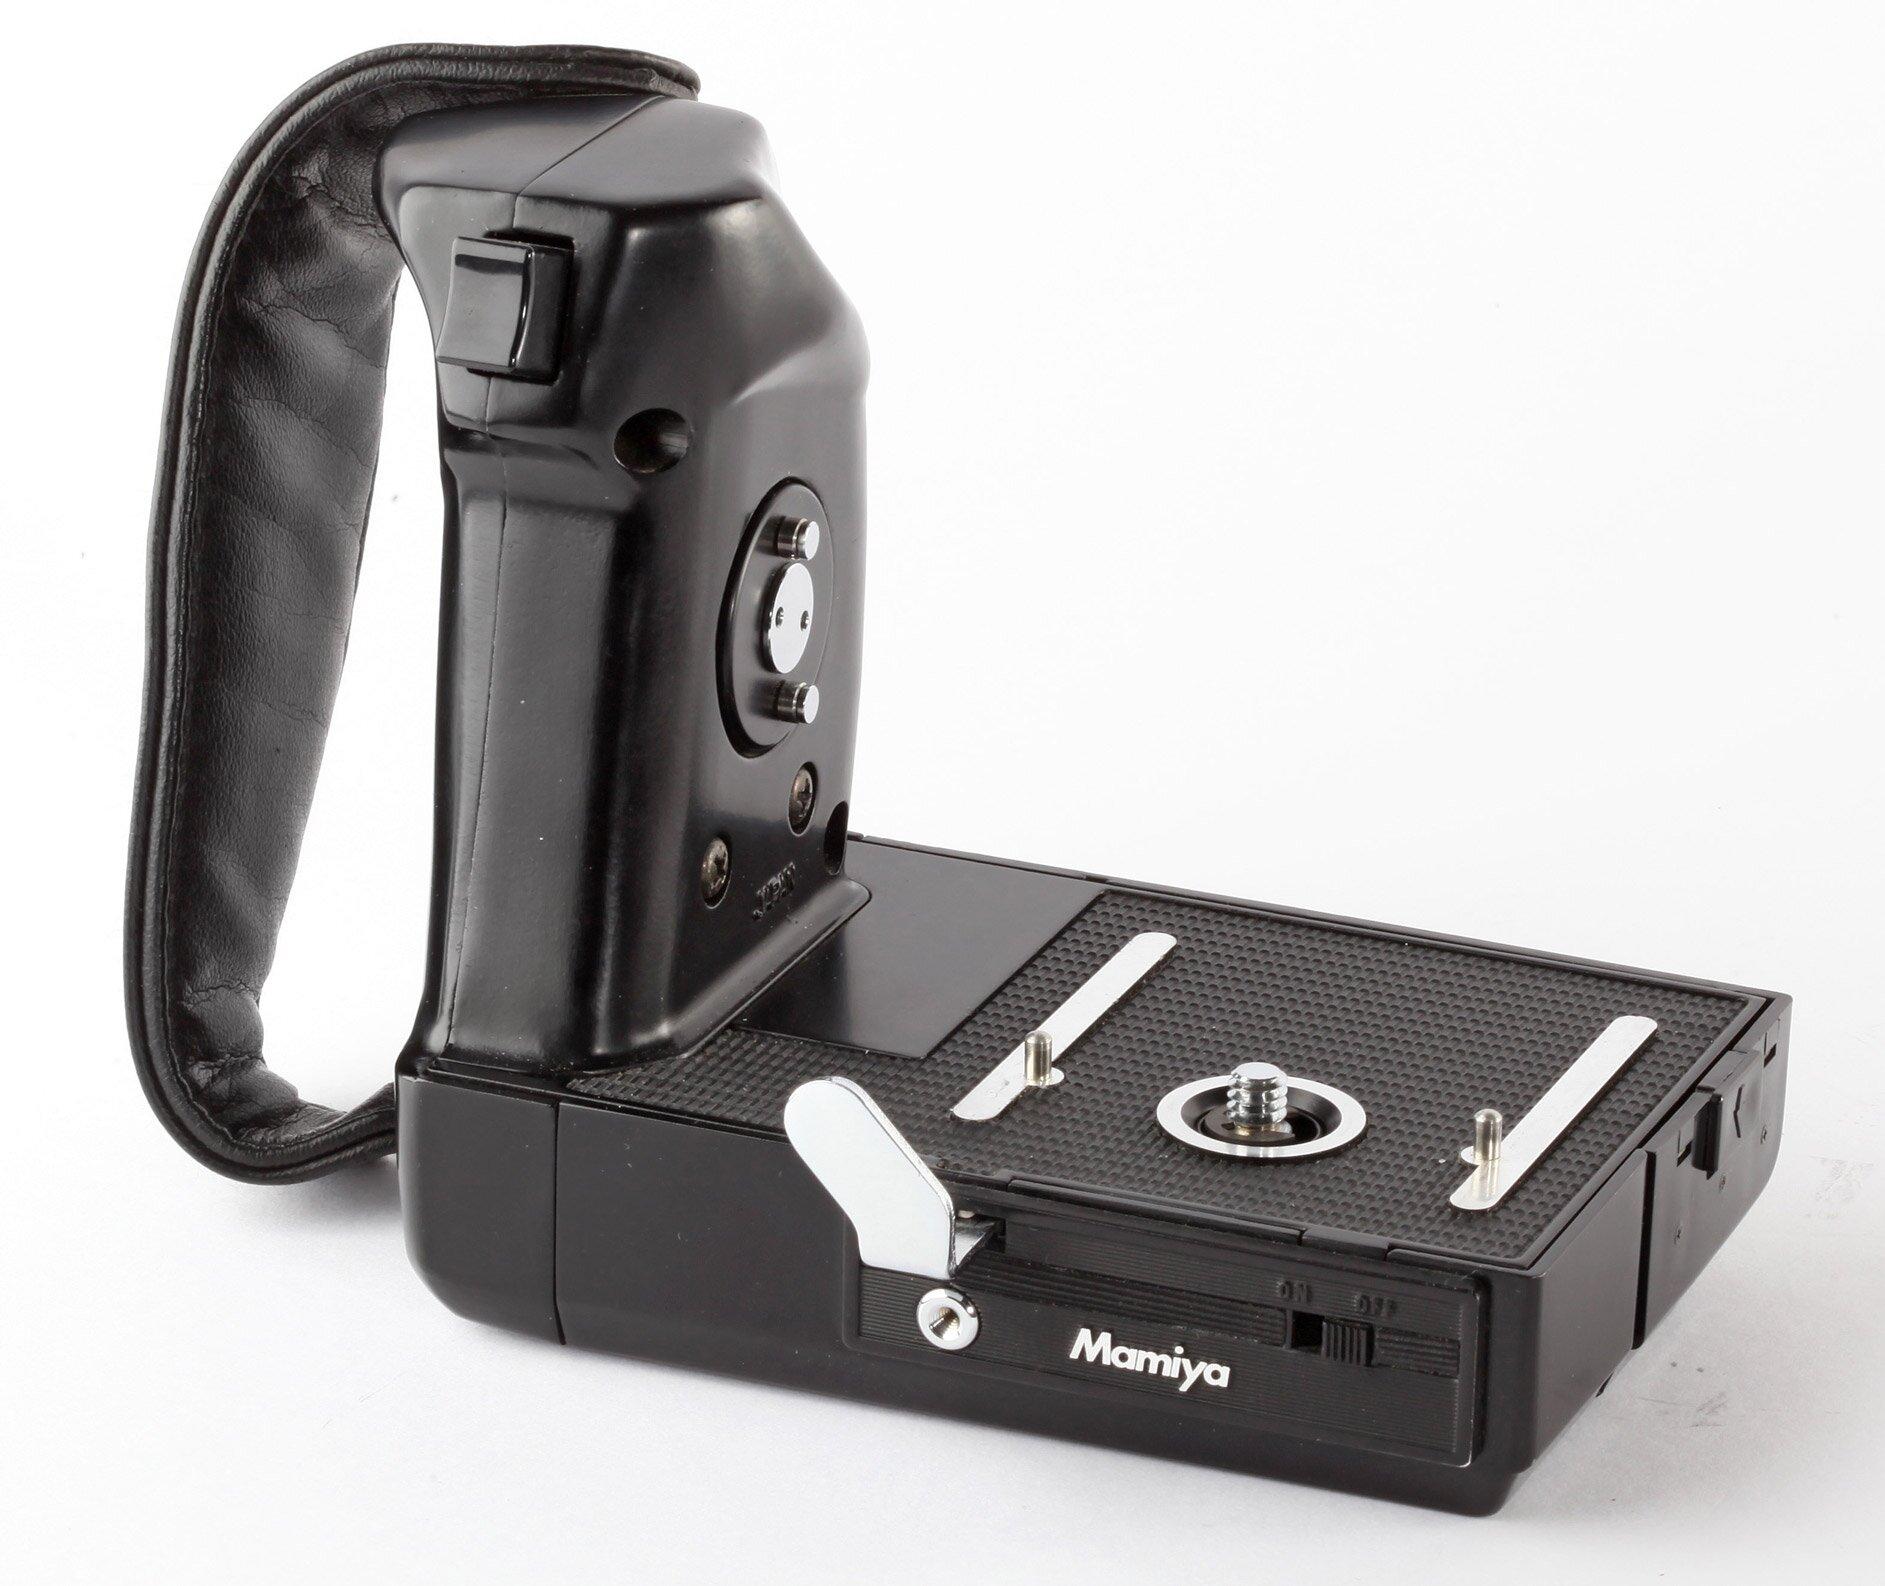 Mamiya 645 Motor Grip Power Drive